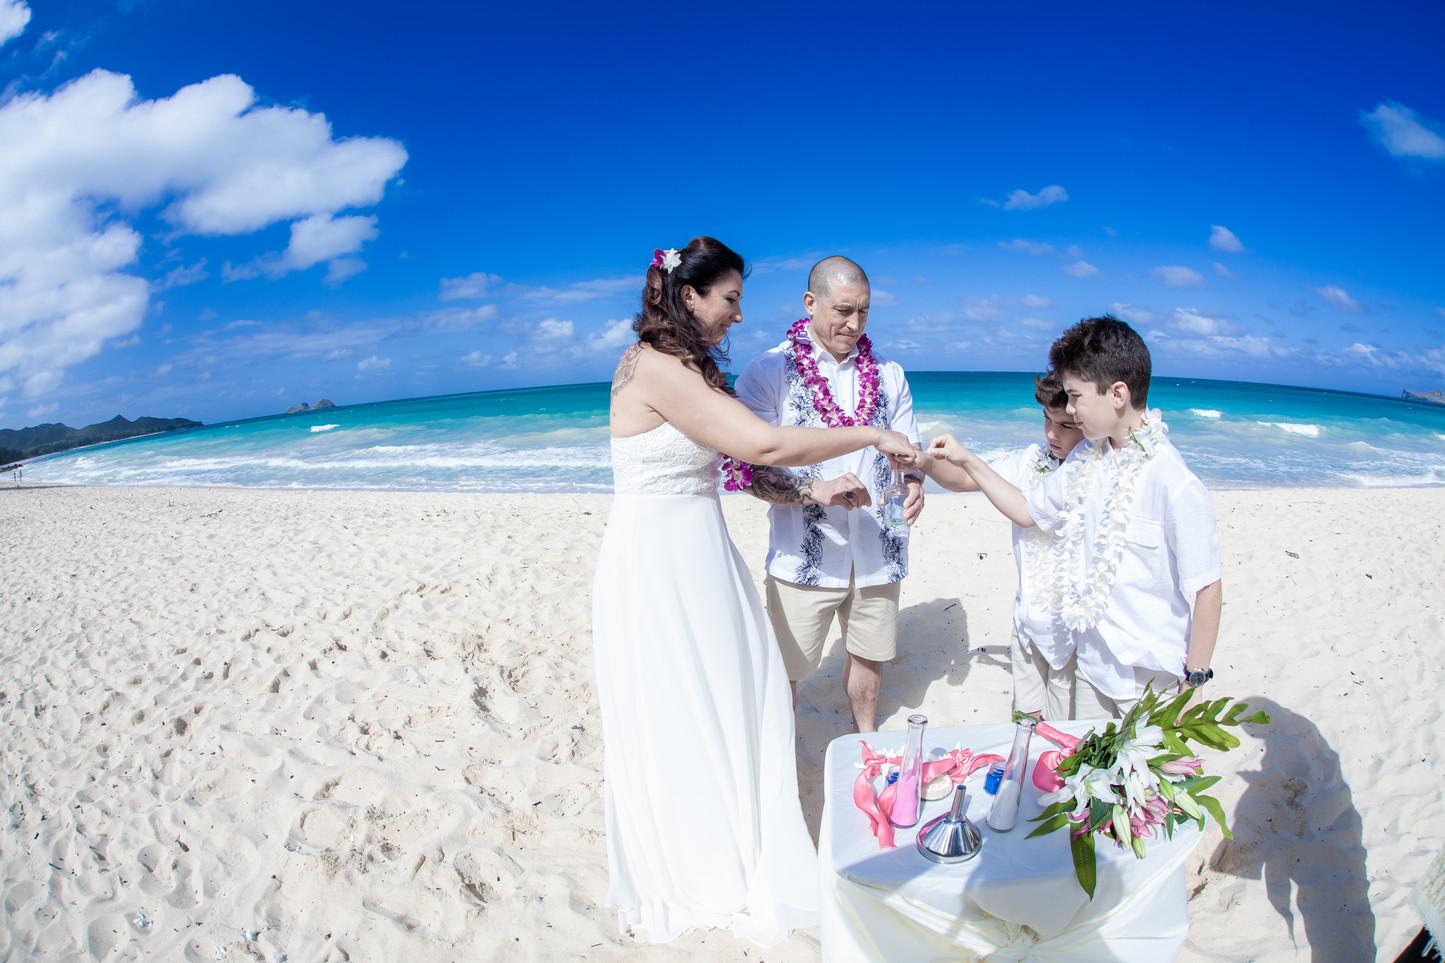 Wedding-picture-2-27.jpg